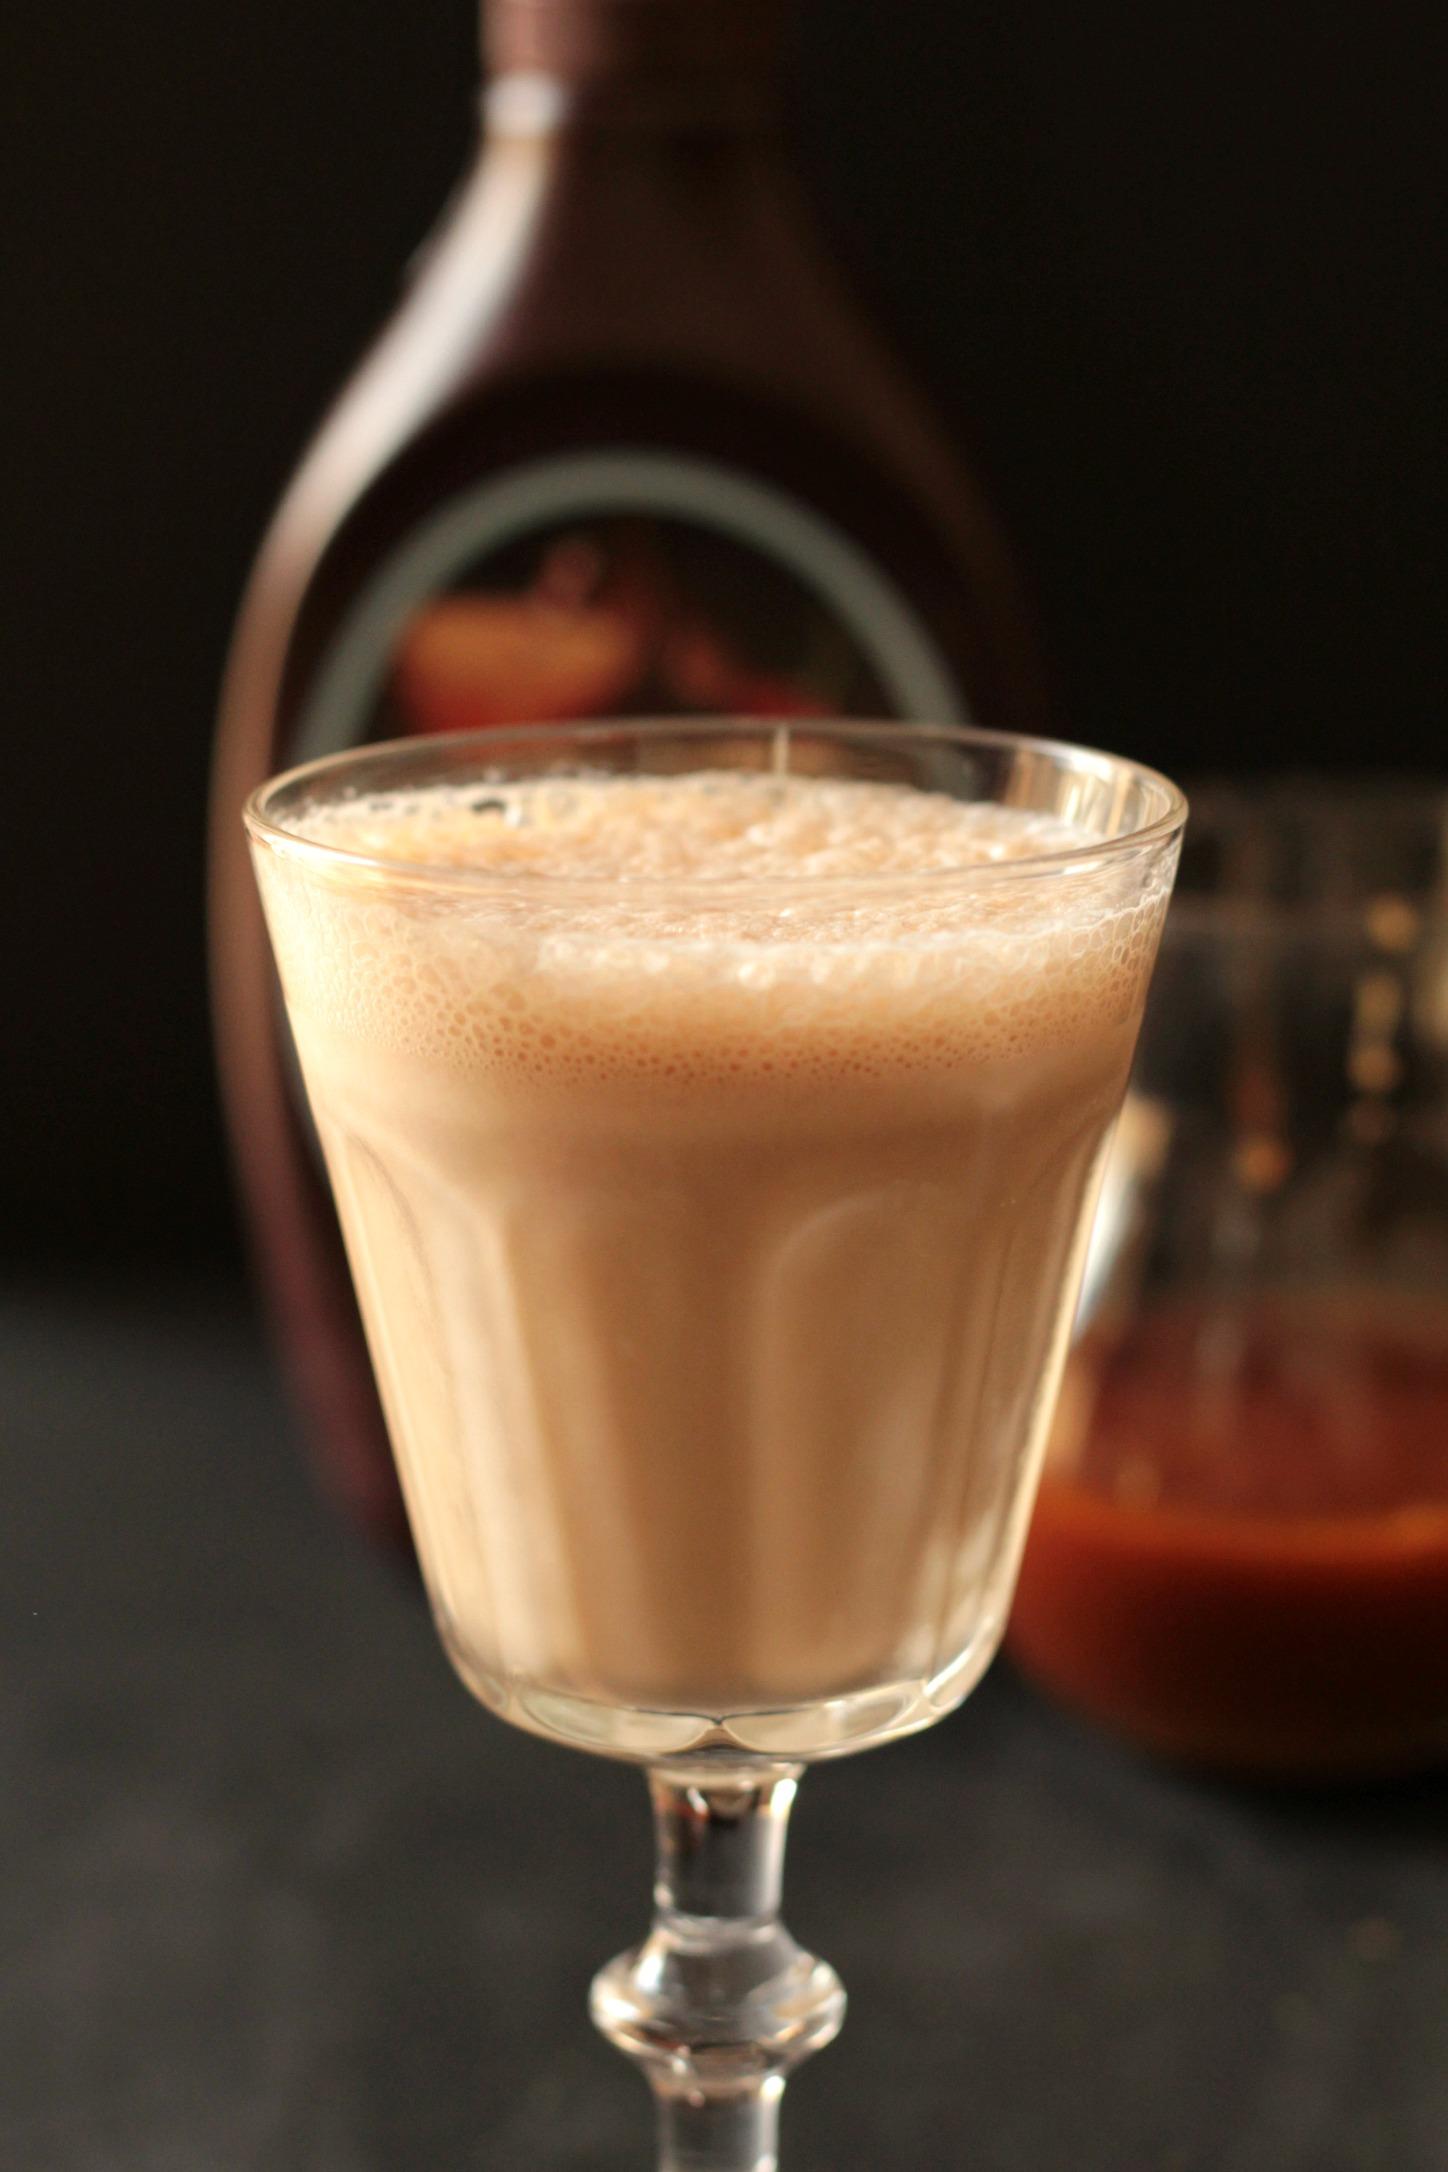 Salted Caramel Mocha Ice Cream Milkshake